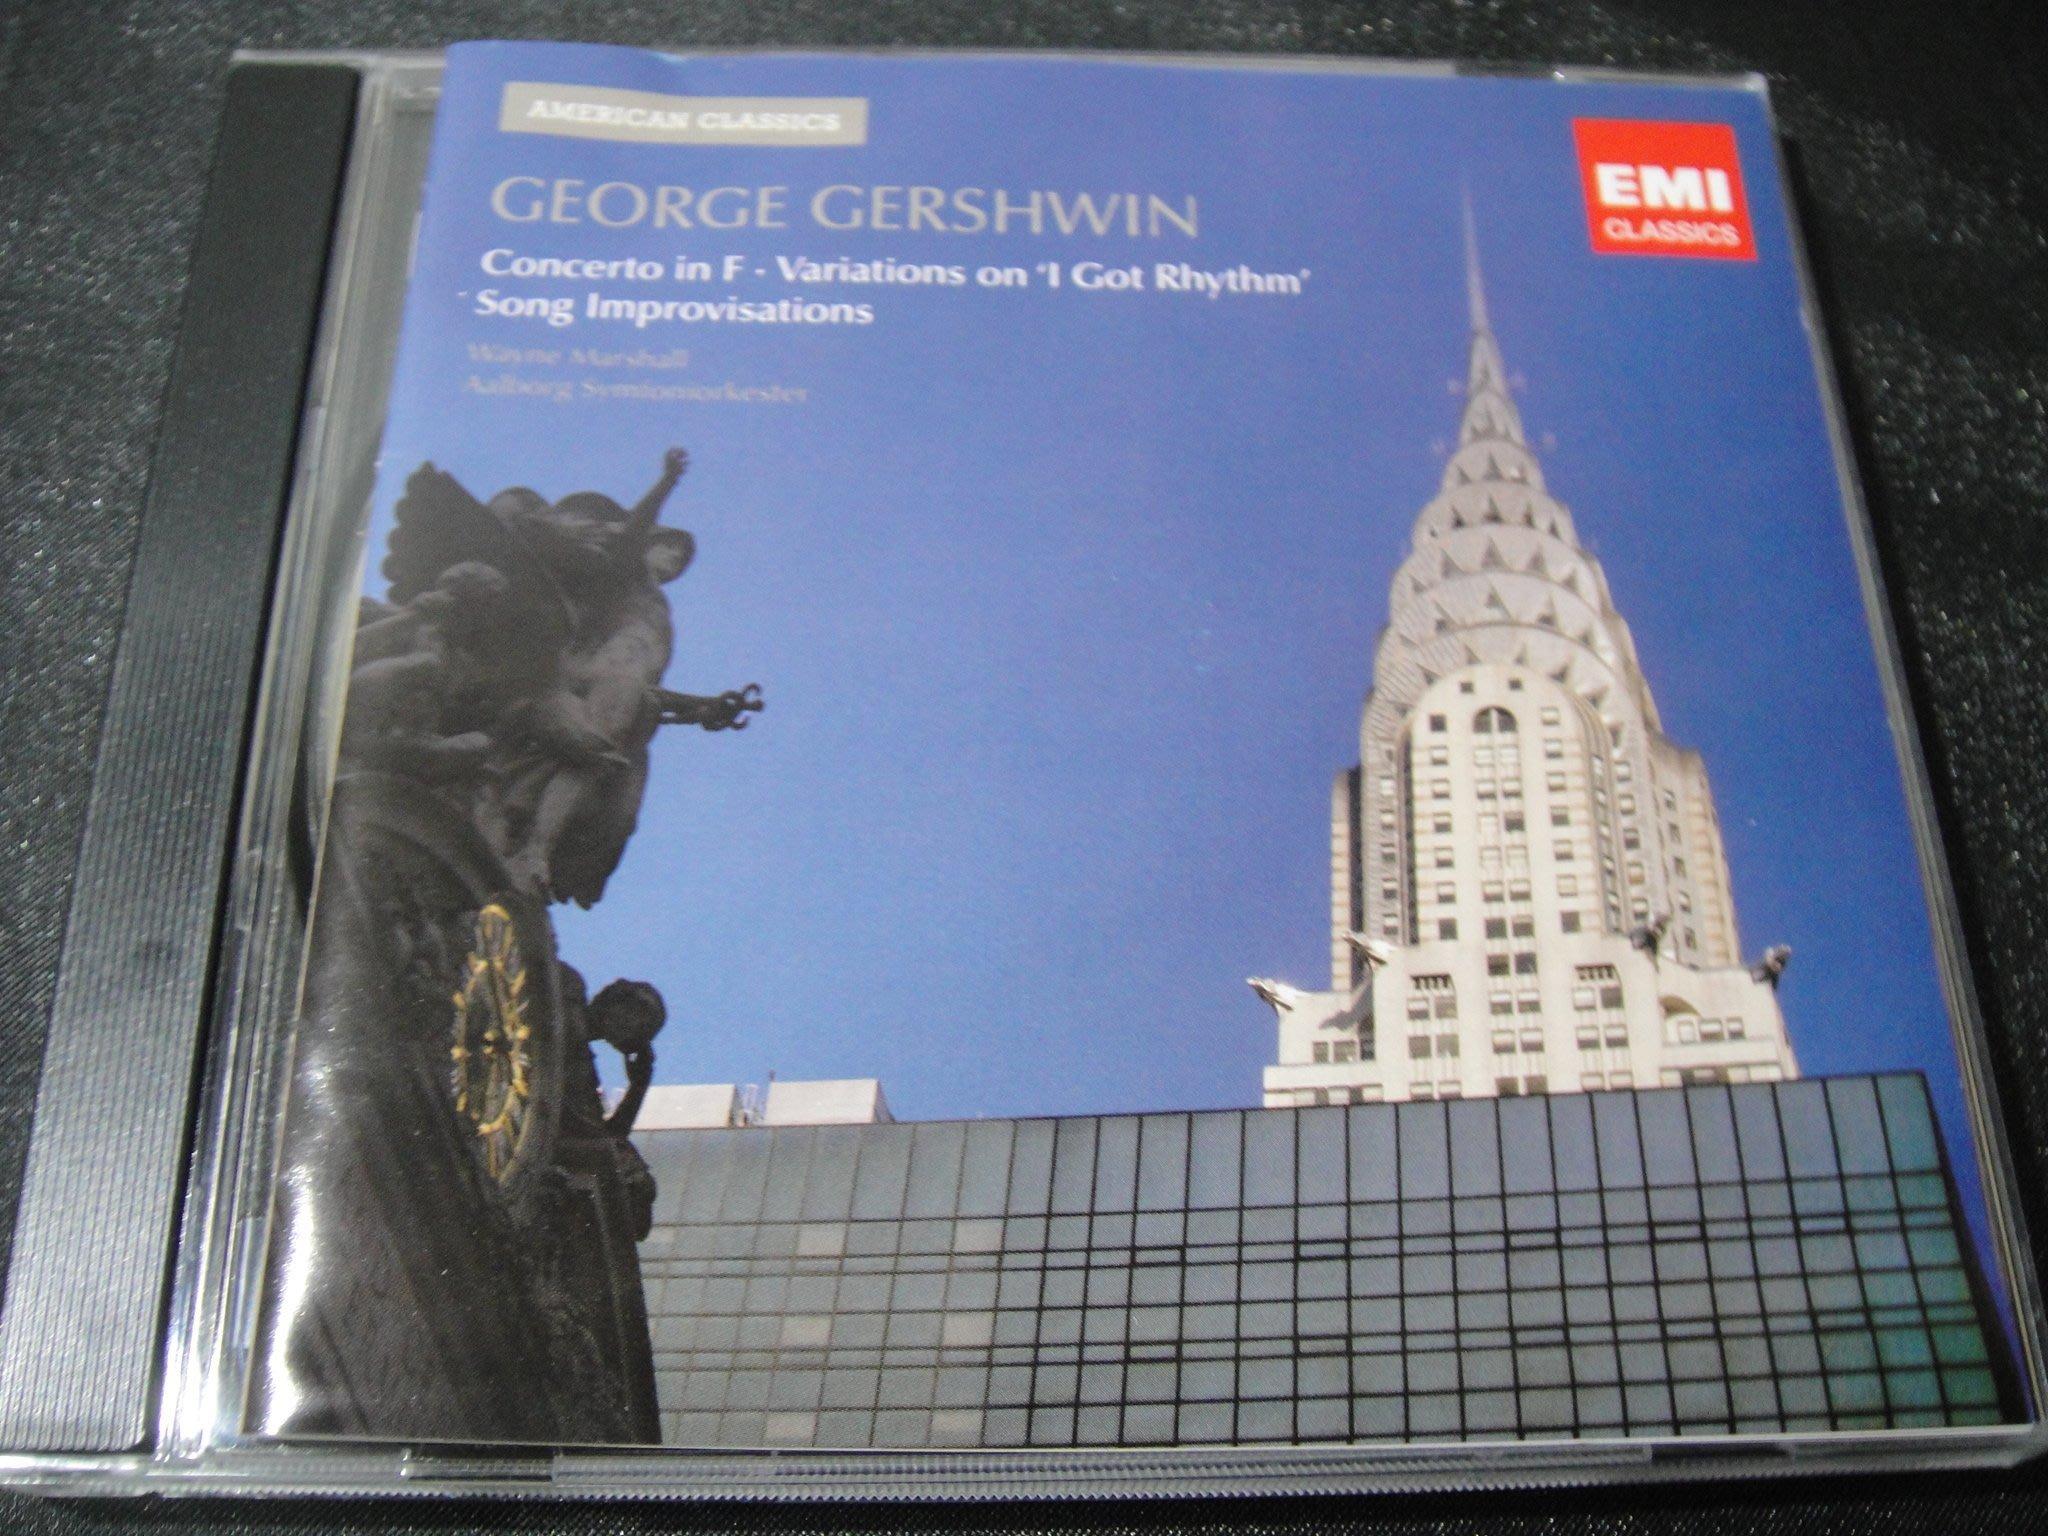 【198樂坊】蓋希文Geogle Gershwin 歌曲 (Summertime...Made In EU)J